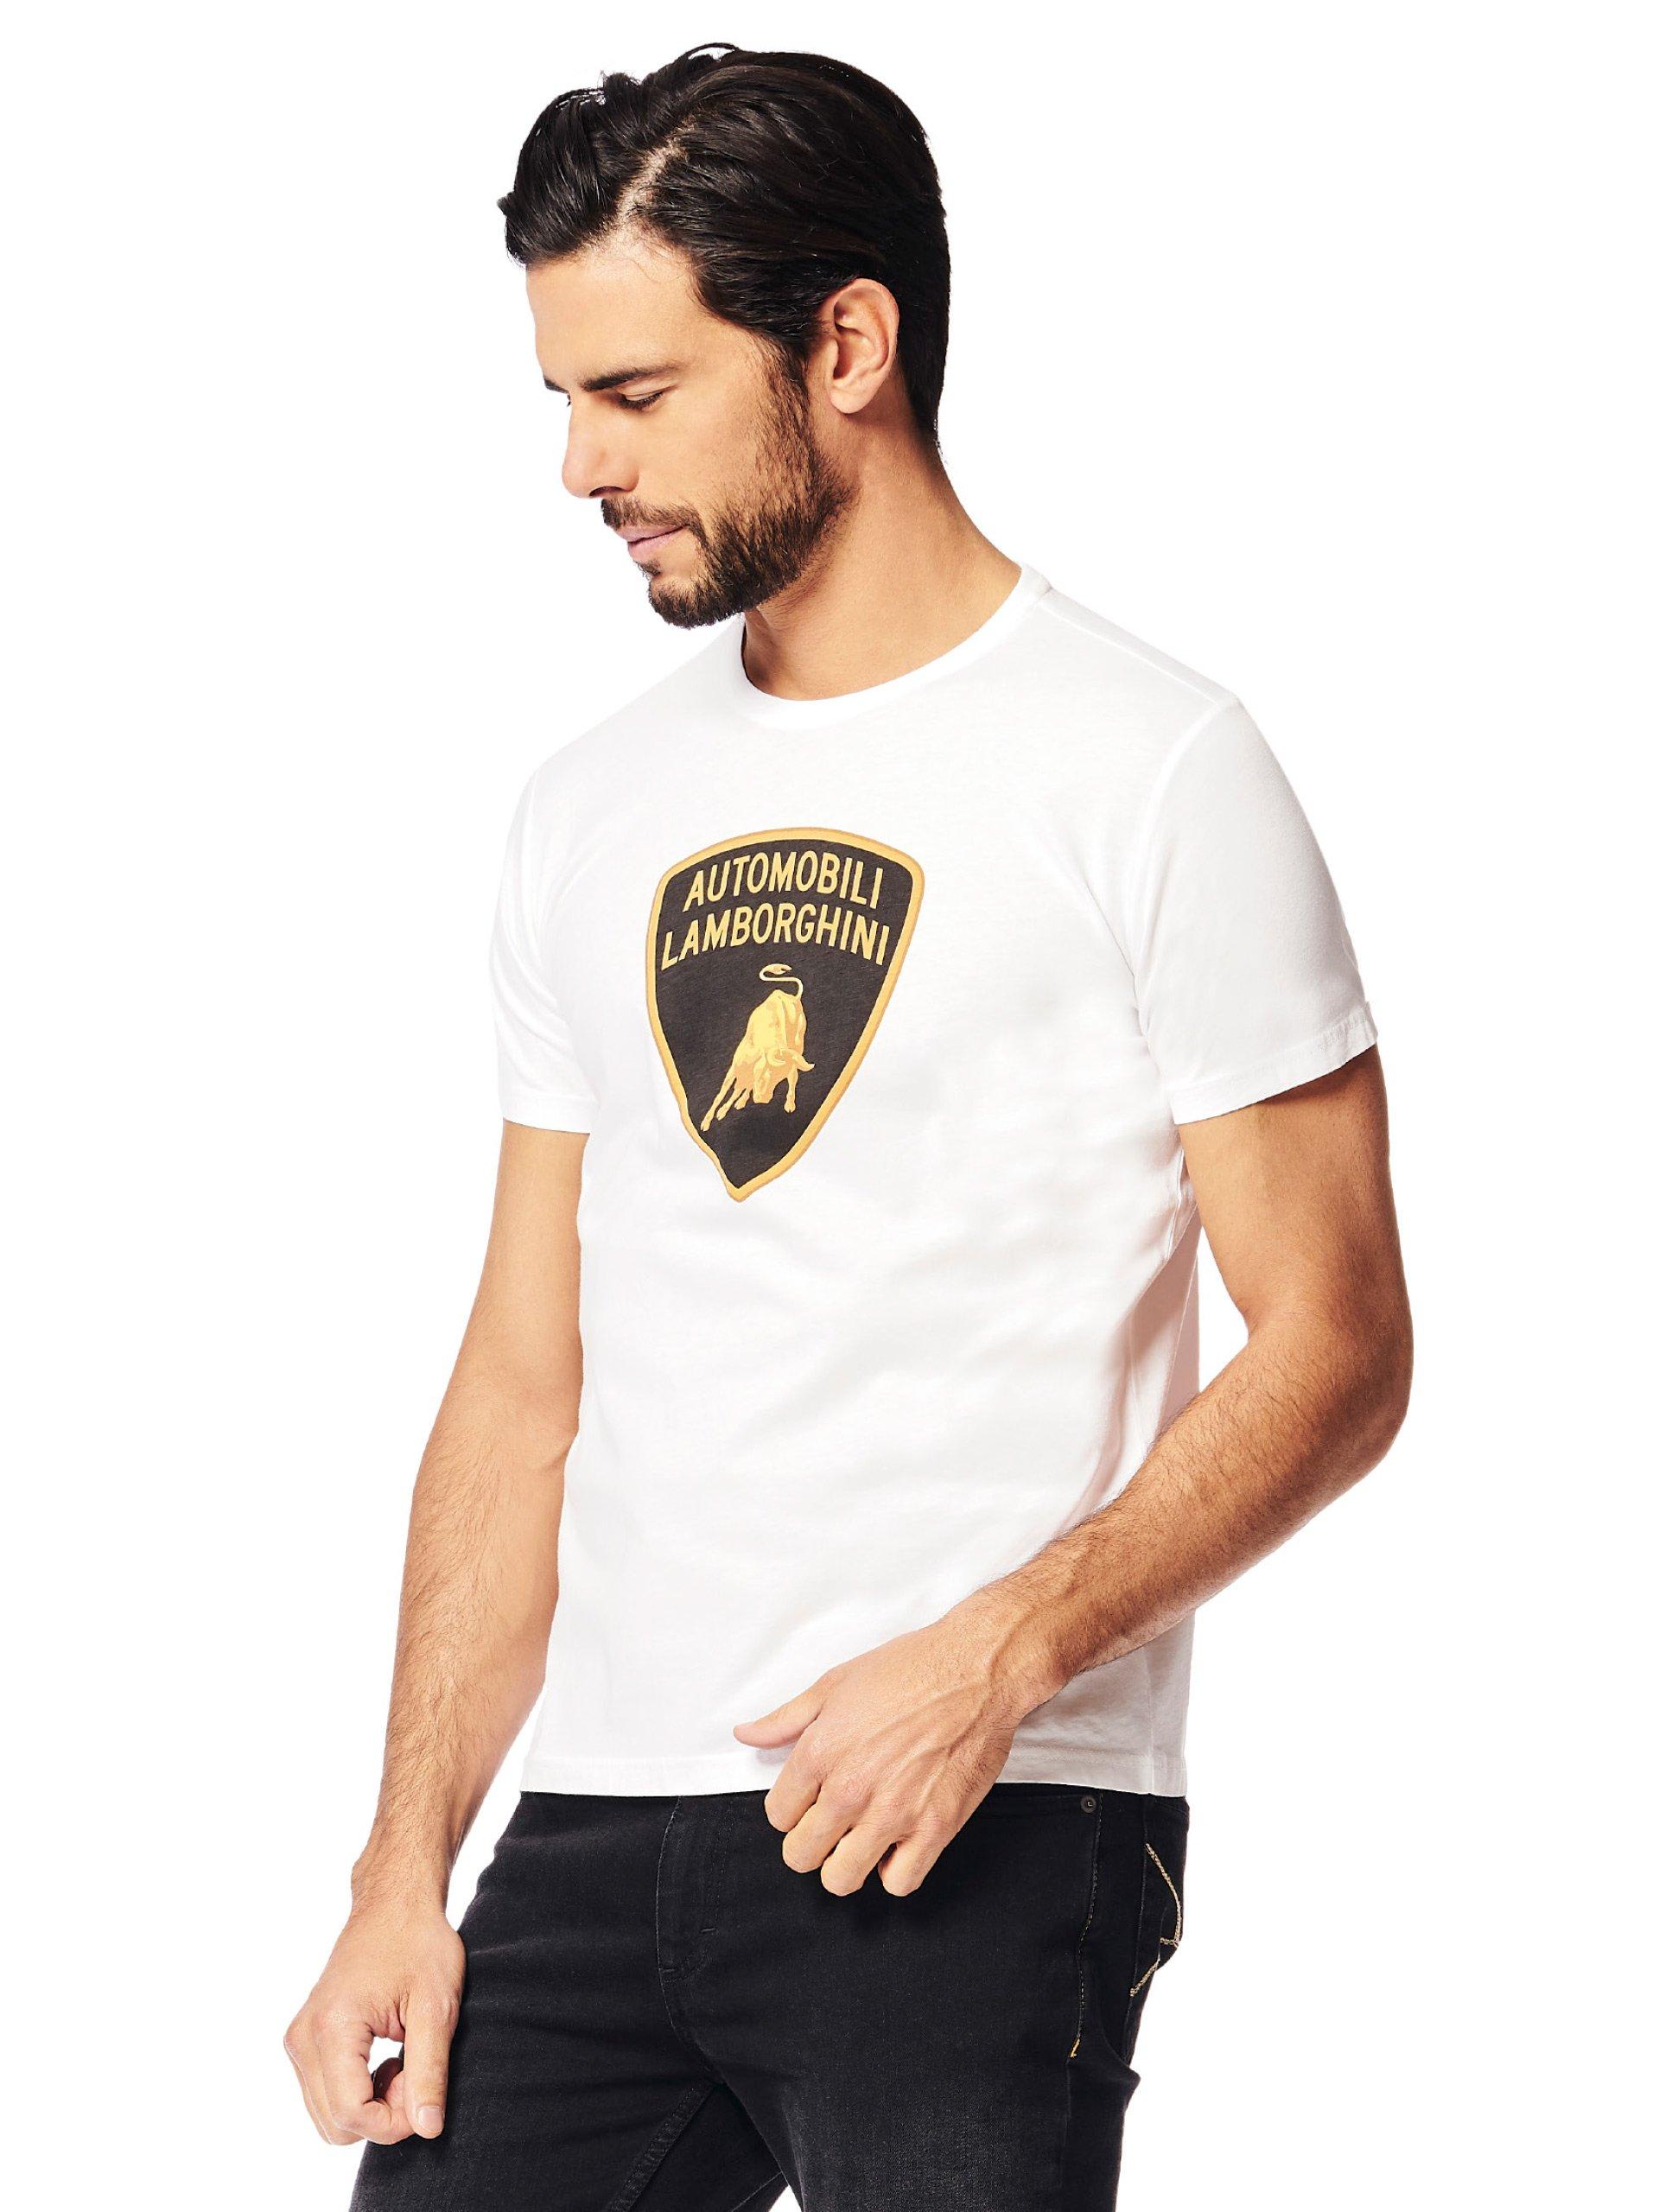 Automobili Lamborghini T-Shirt Scudo Lamborghini Uomo